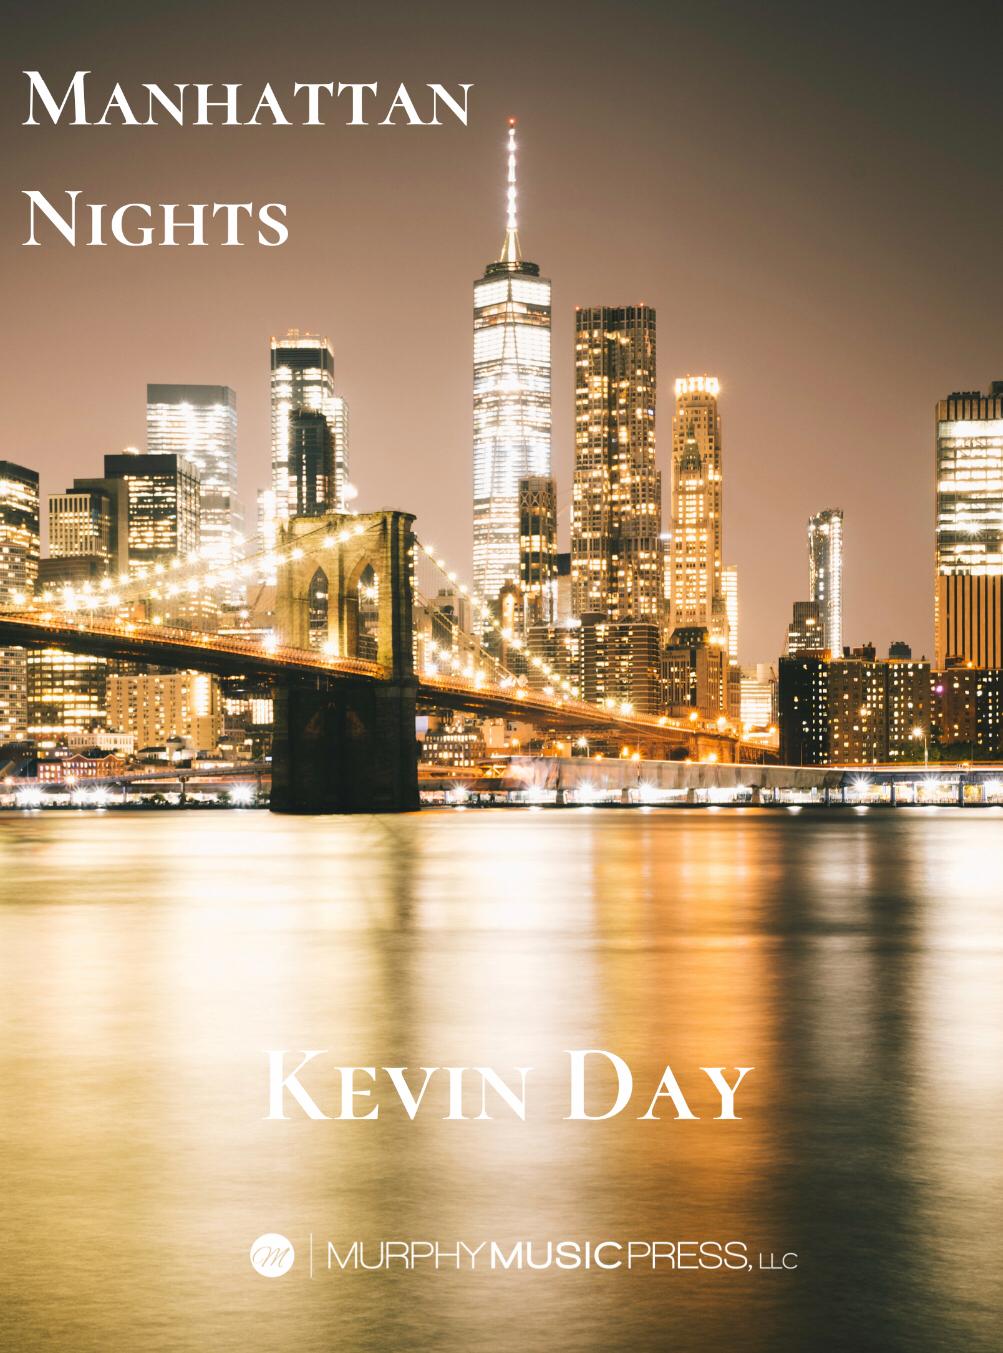 Manhattan Nights by Kevin Day